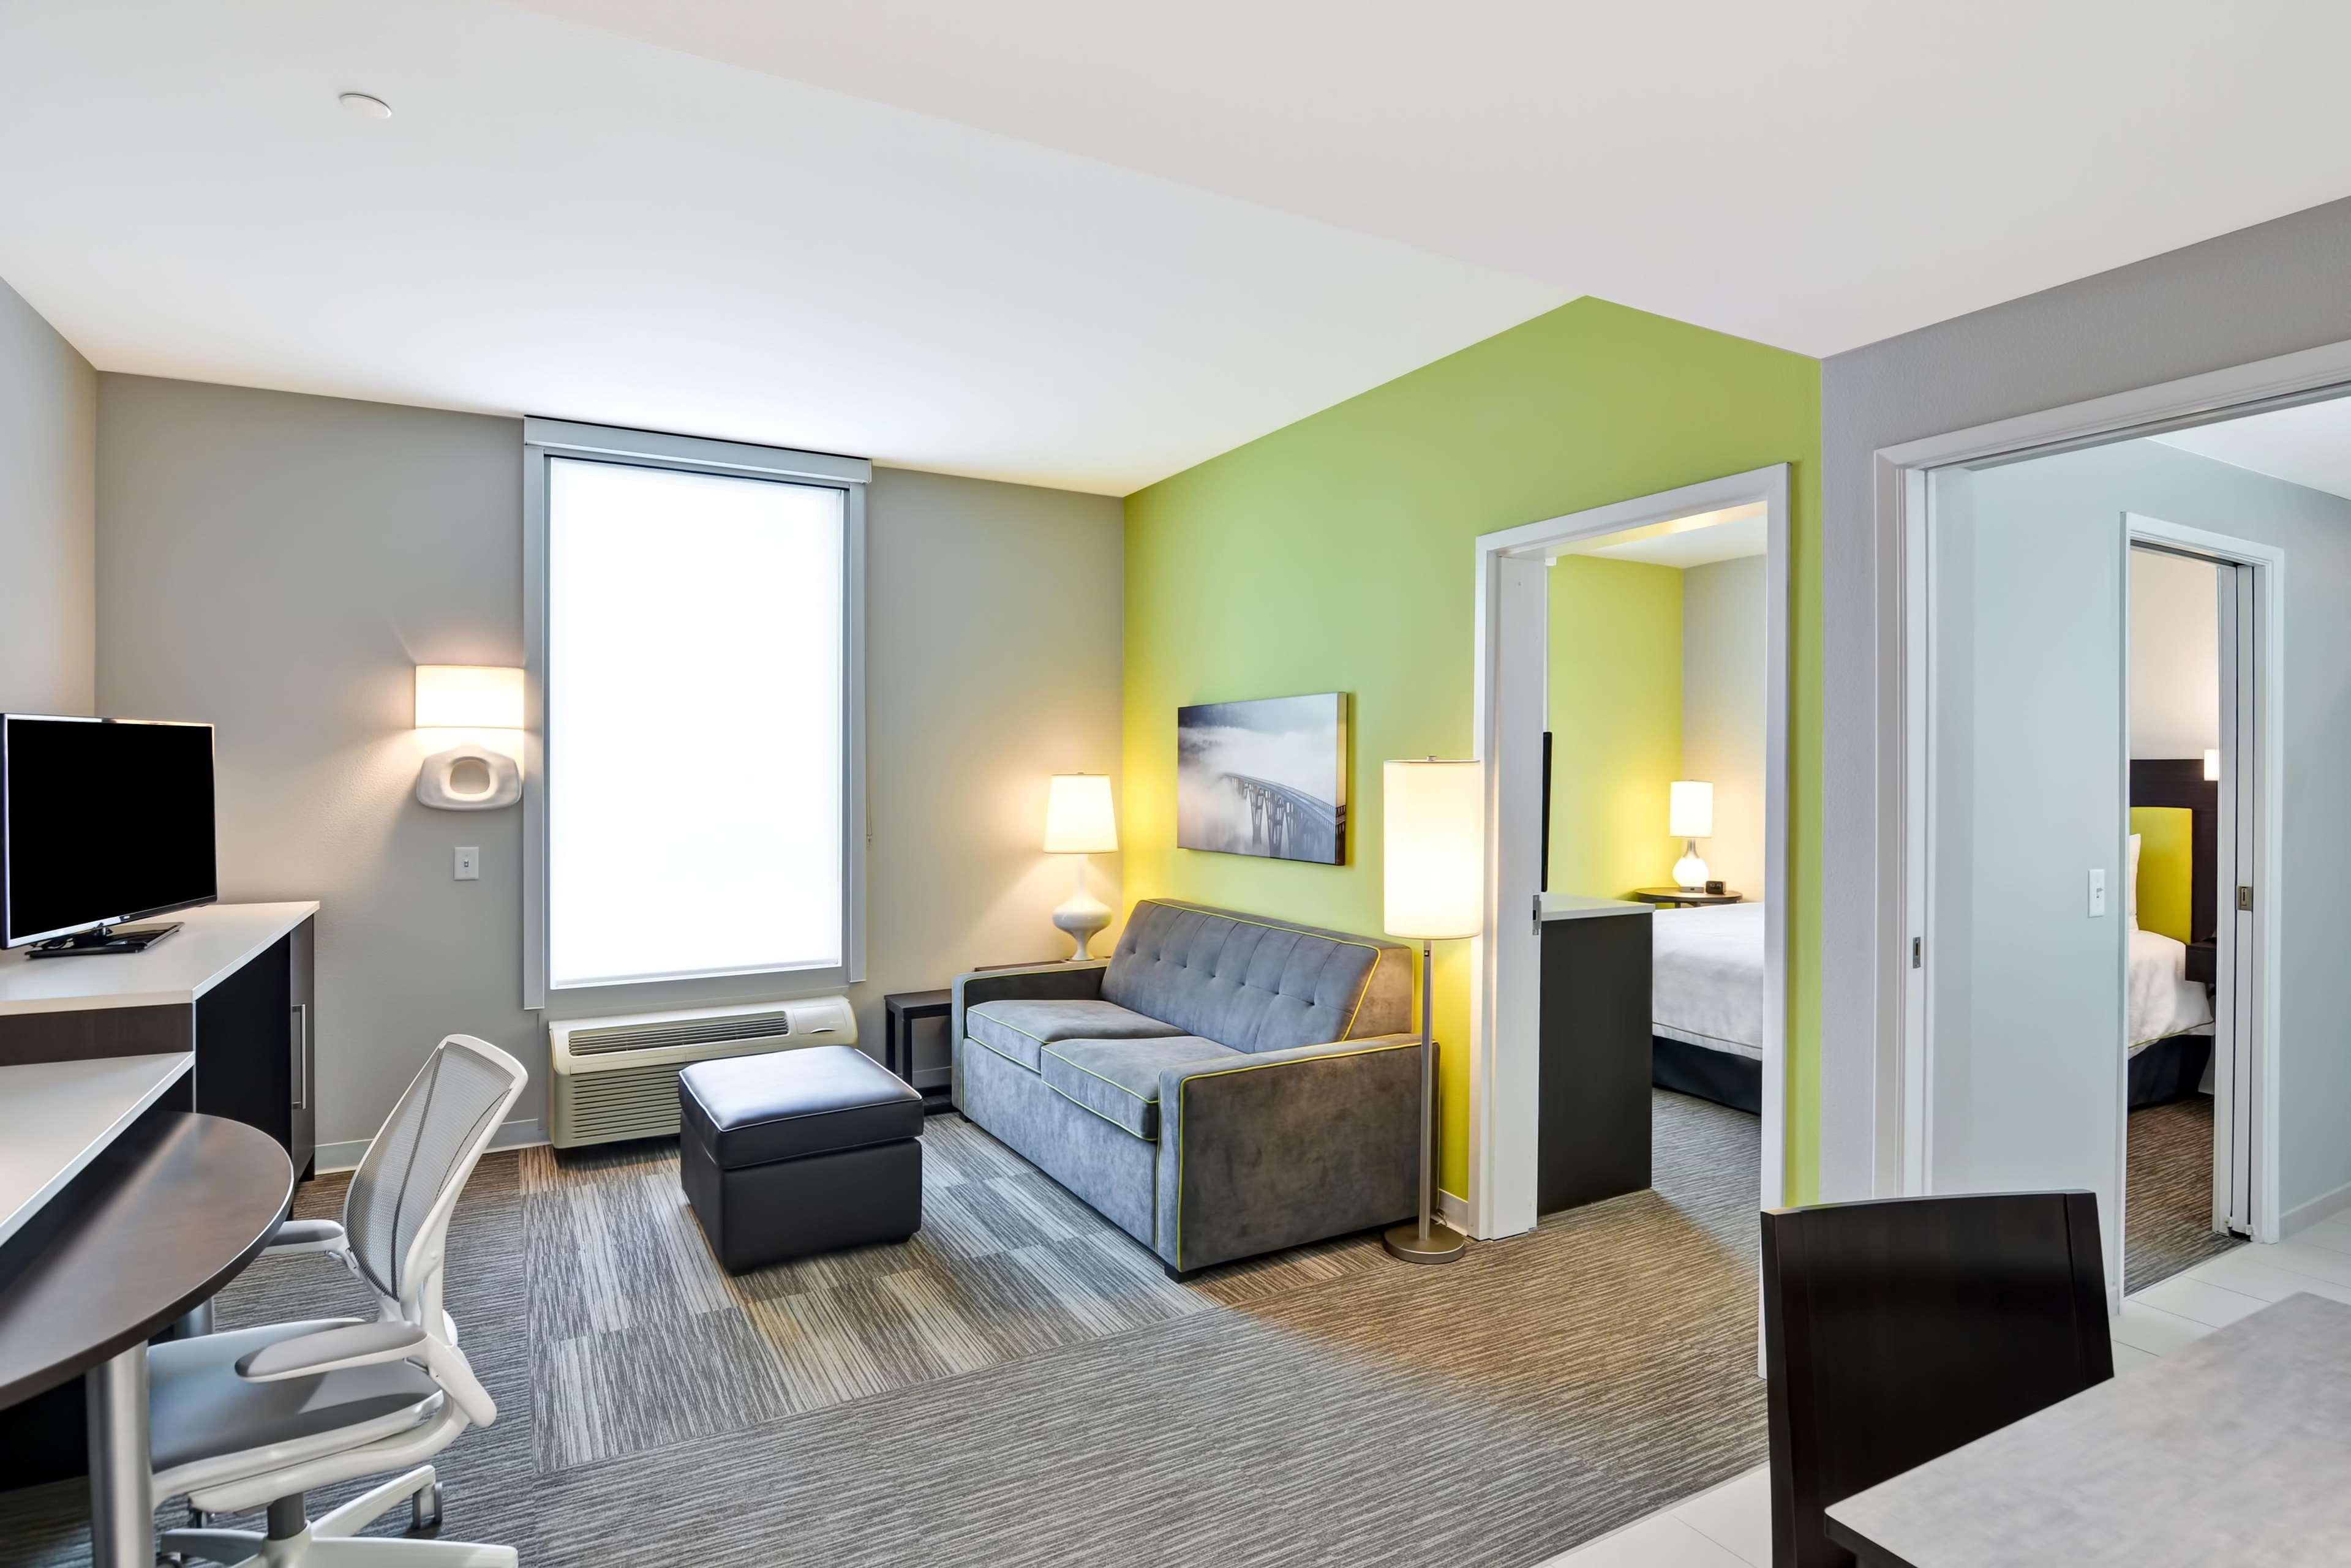 Home2 Suites by Hilton Azusa image 13